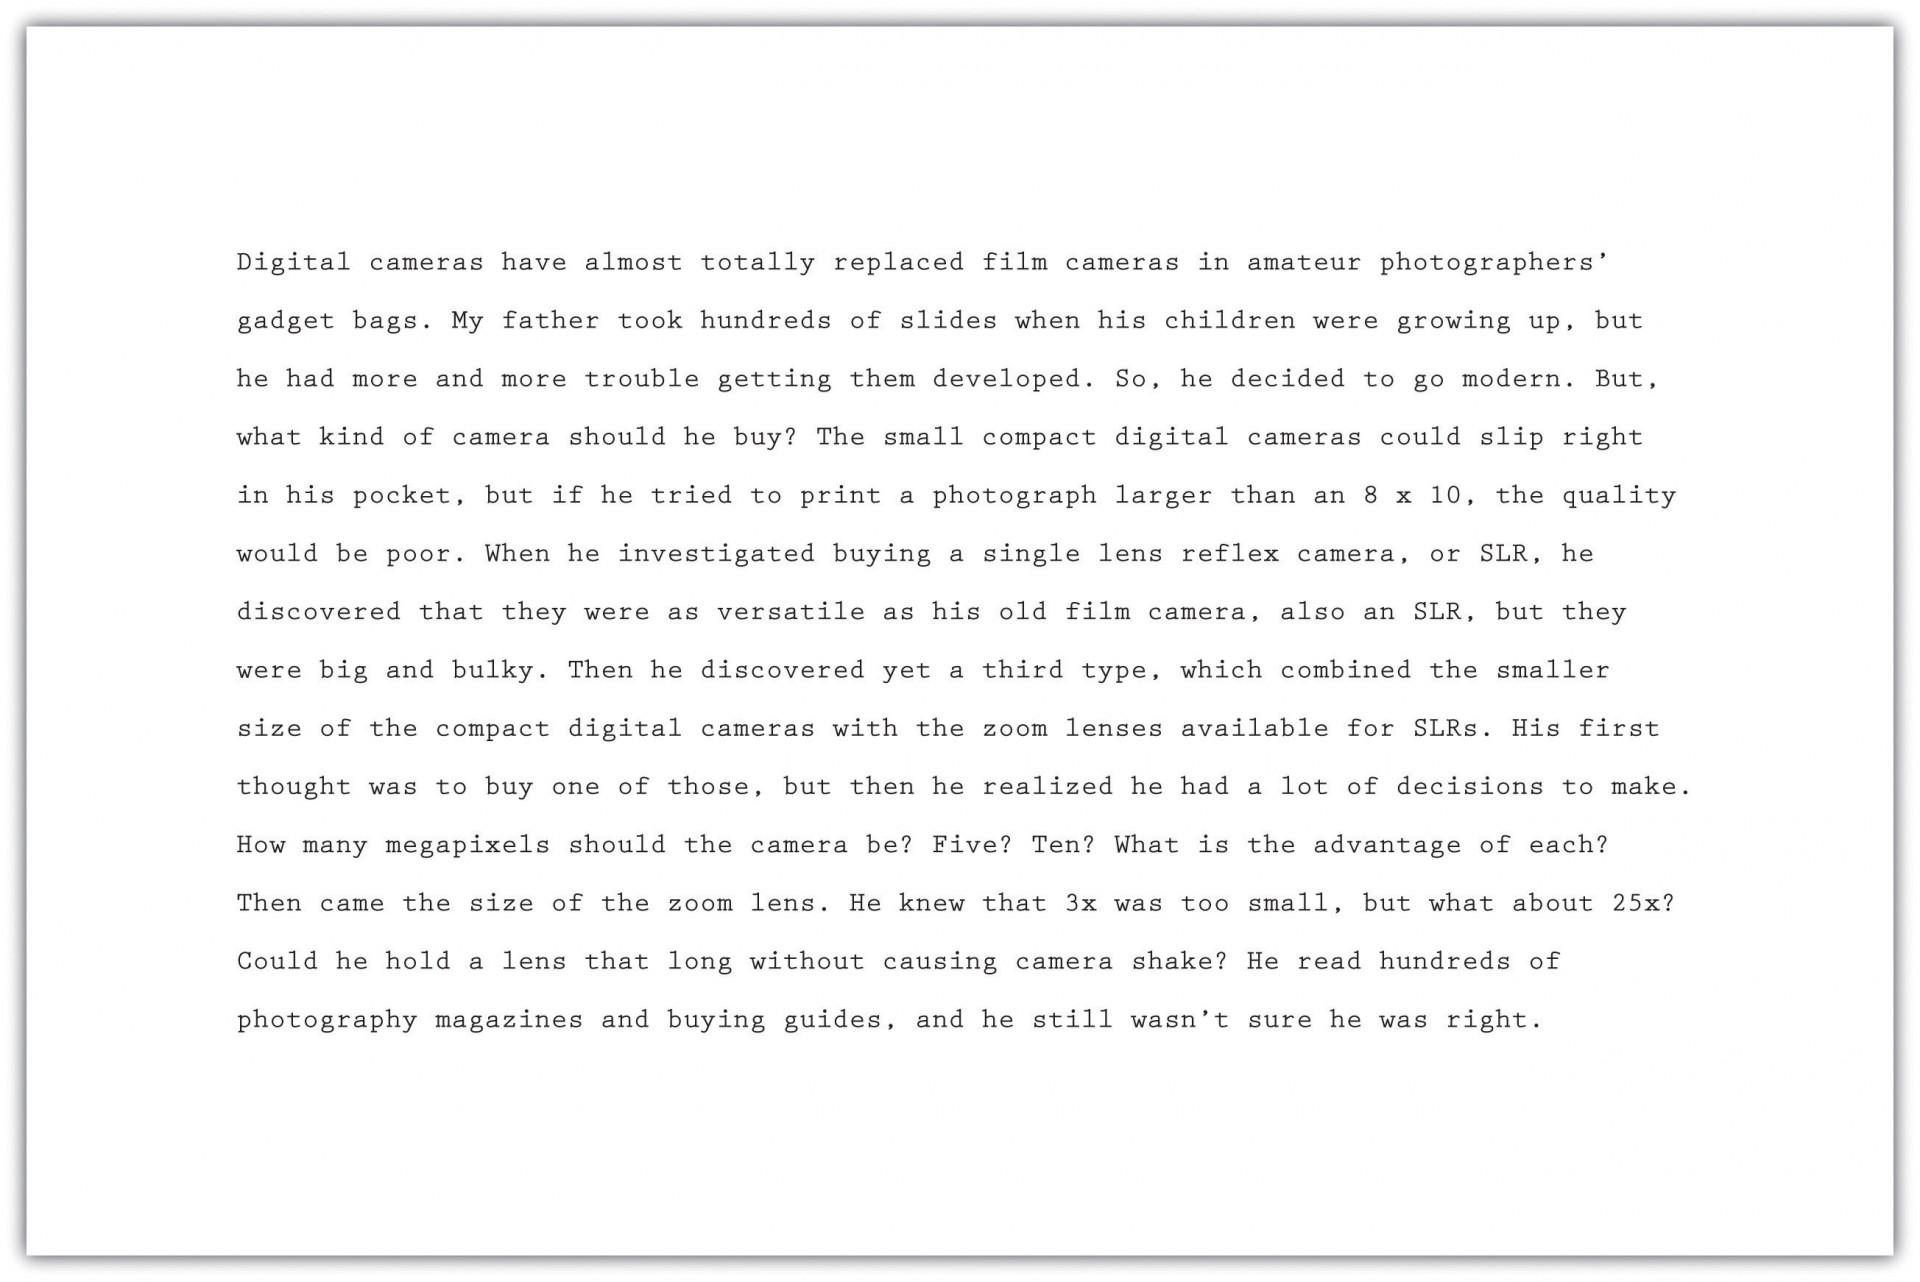 012 Descriptive Essay Topics Exceptional Writing For Ibps Po Mains High School Students Prompts 1920